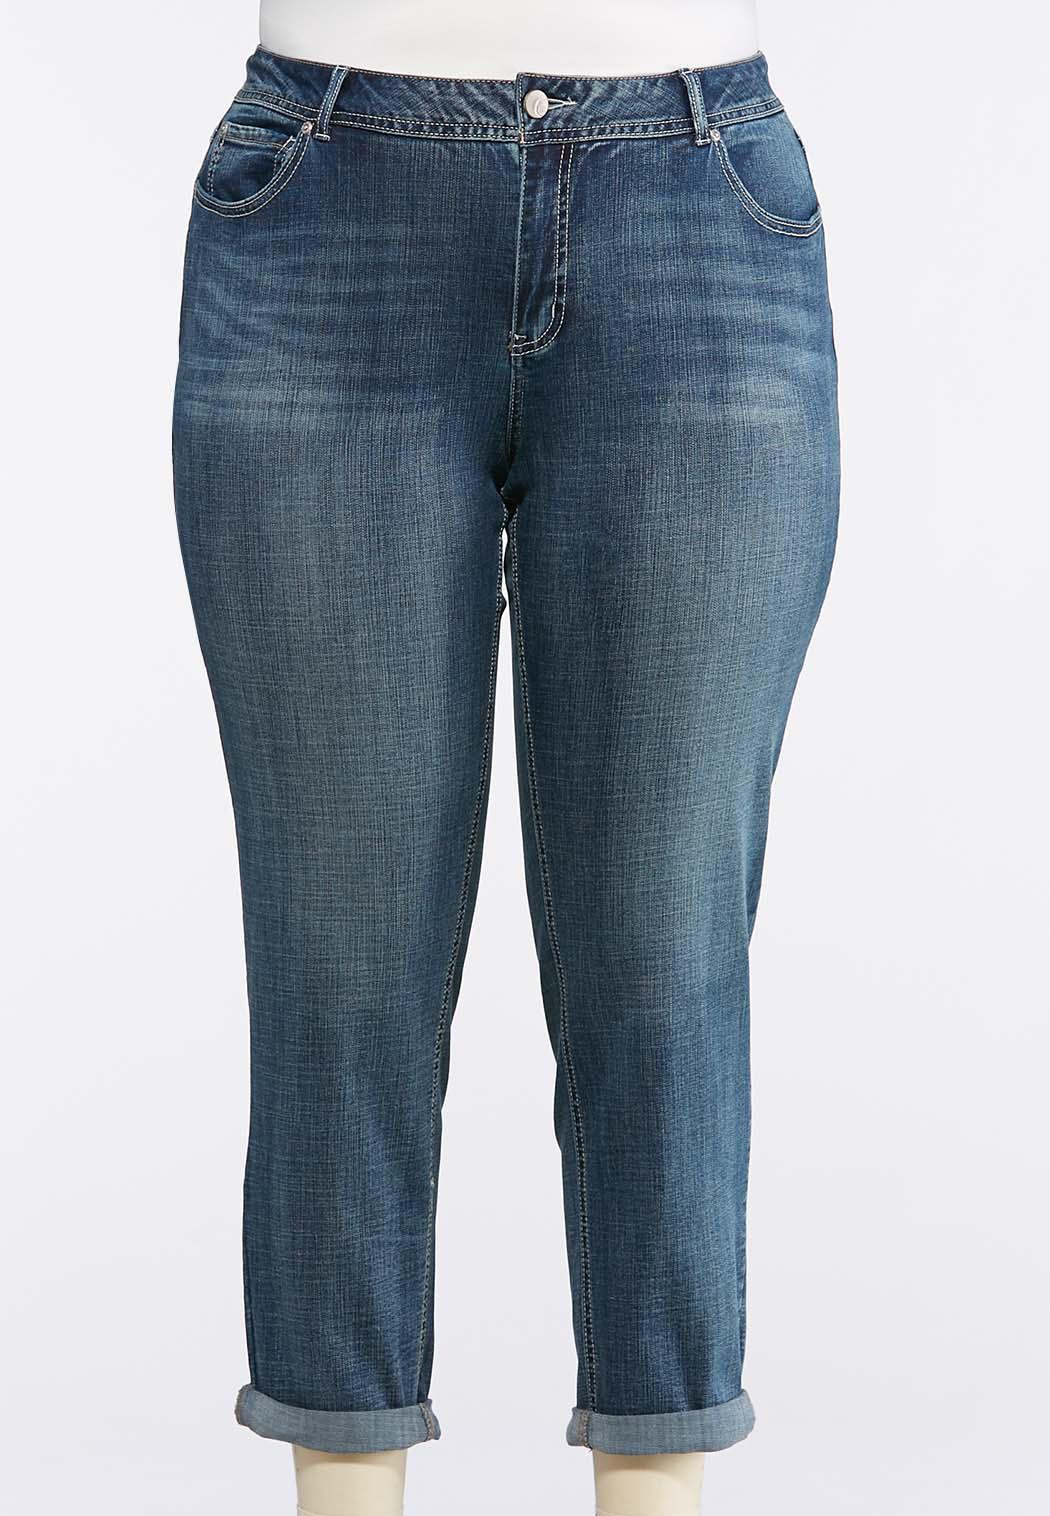 Plus Petite Light Wash Skinny Ankle Jeans